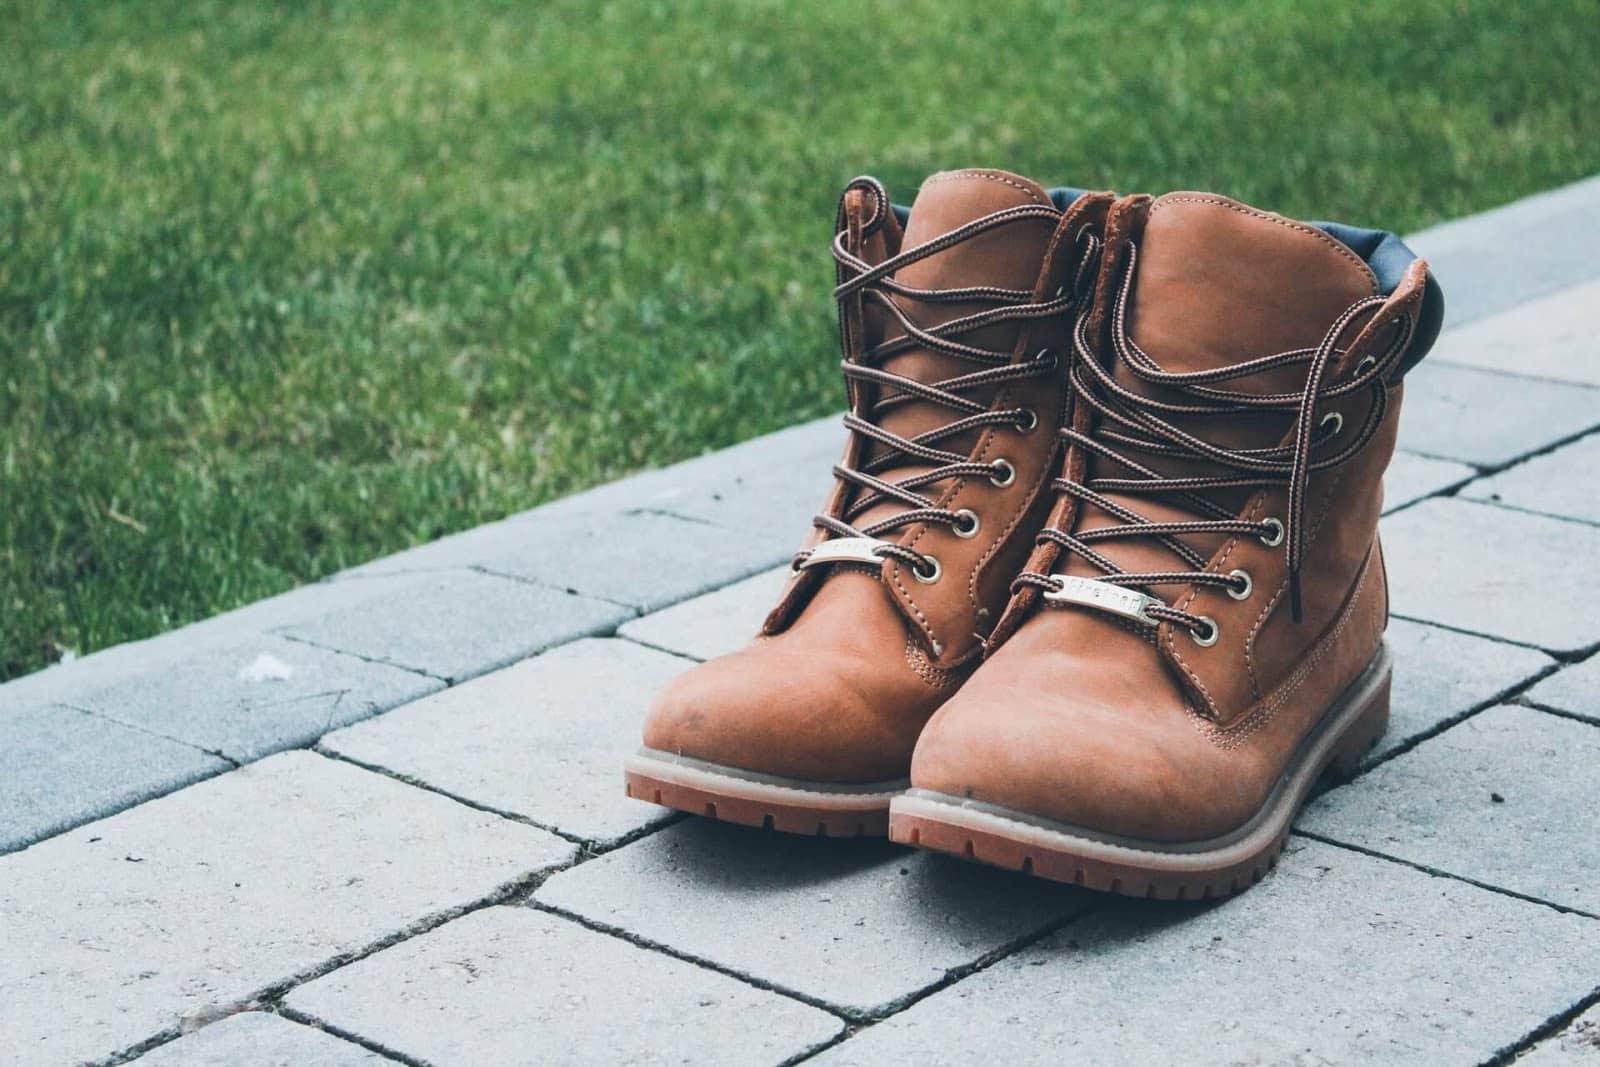 timberland boots on a pavement